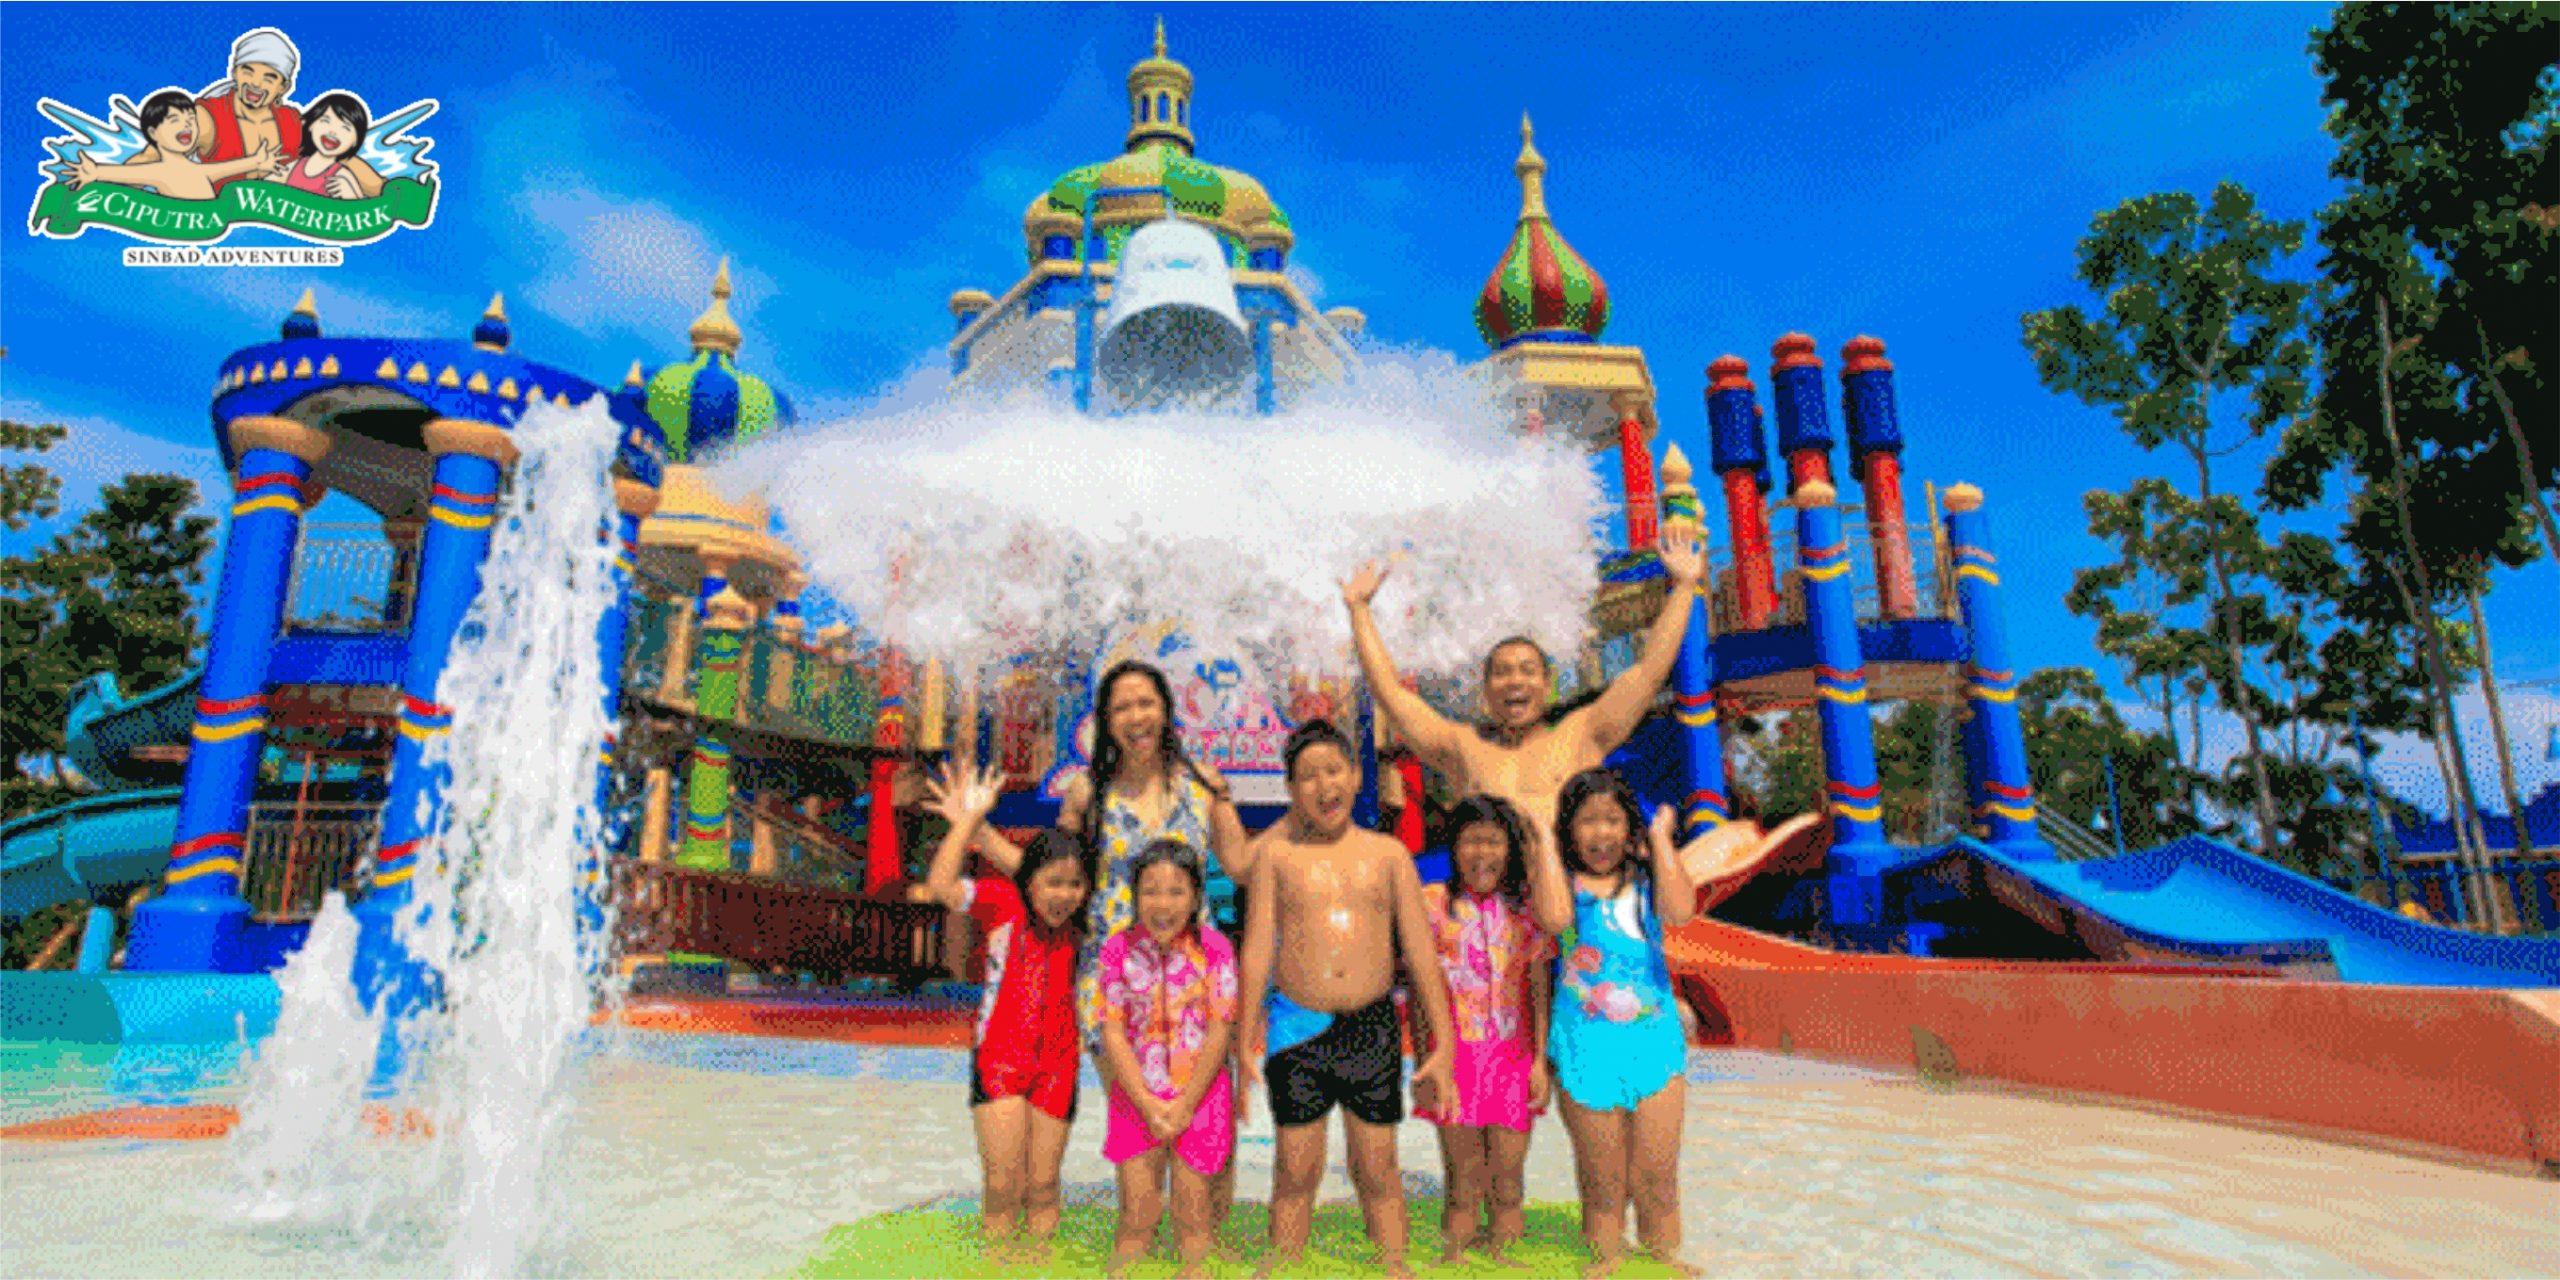 Sinbad's Playground